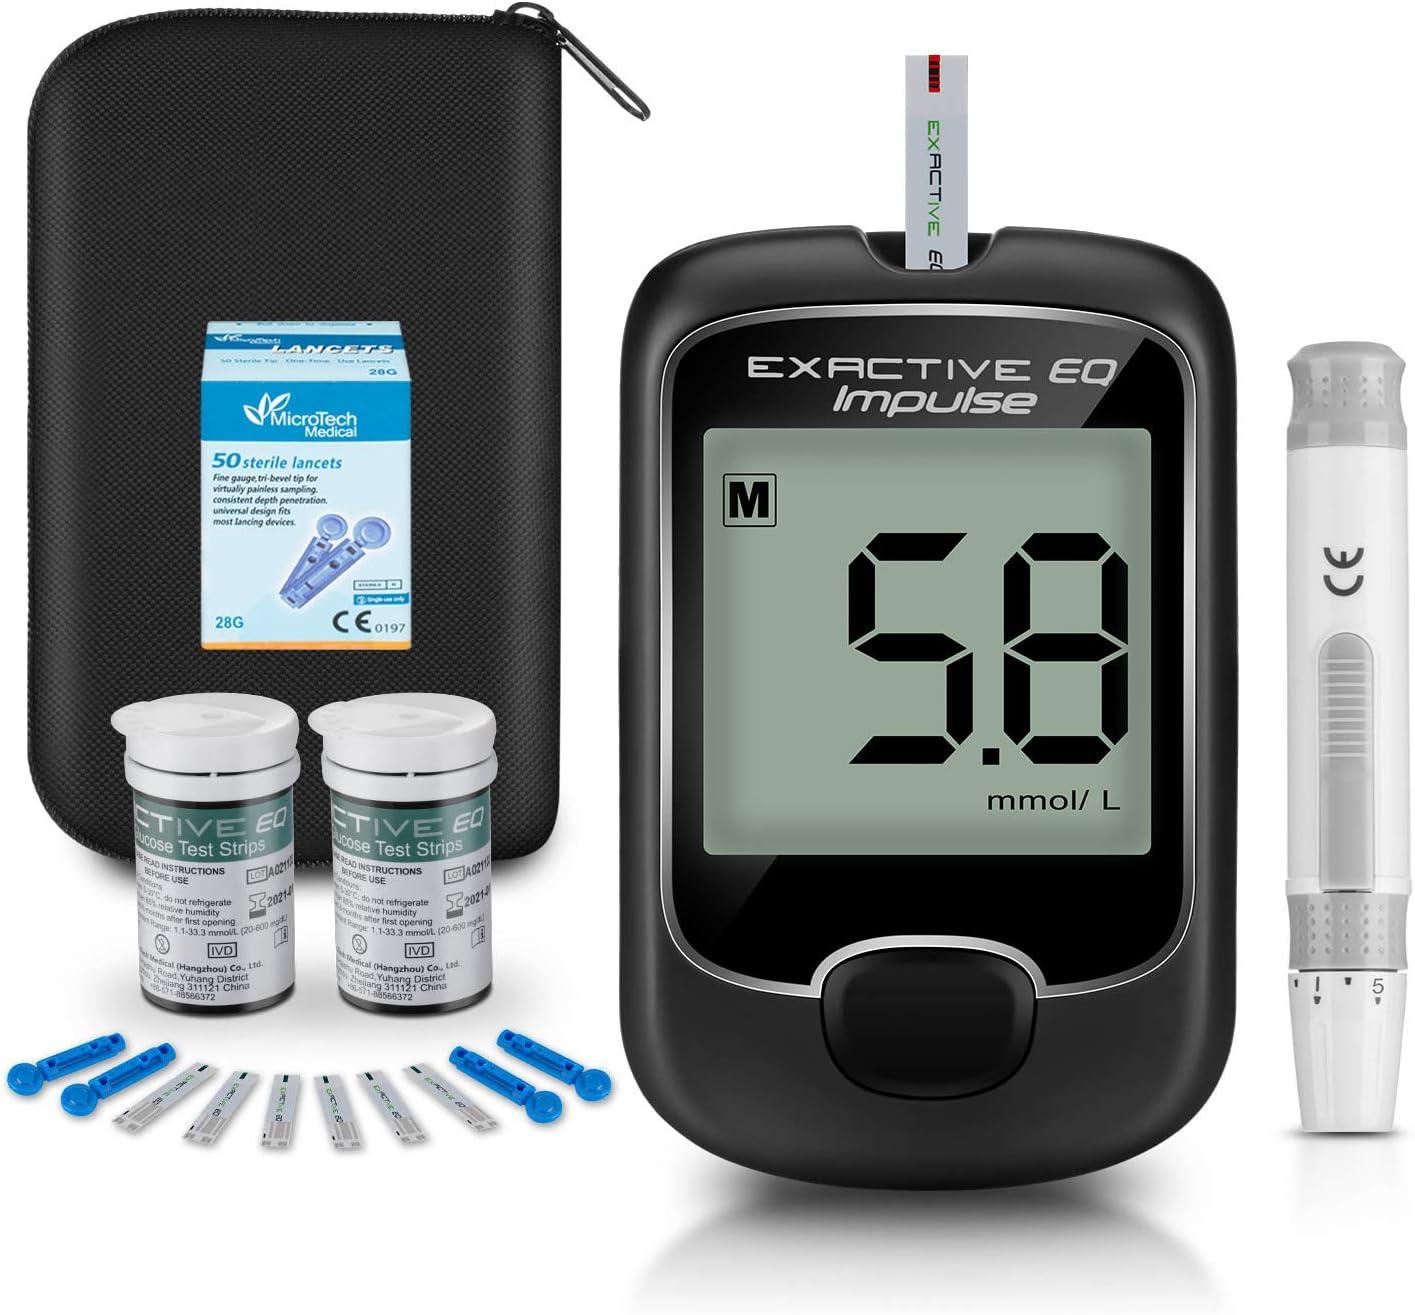 Medidor de glucosa en sangre, kit de prueba de glucosa en sangre con codefree tiras de prueba de glucosa en sangre x 50 y dispositivo de punción por Exactive EQ Impulse - mg/dL